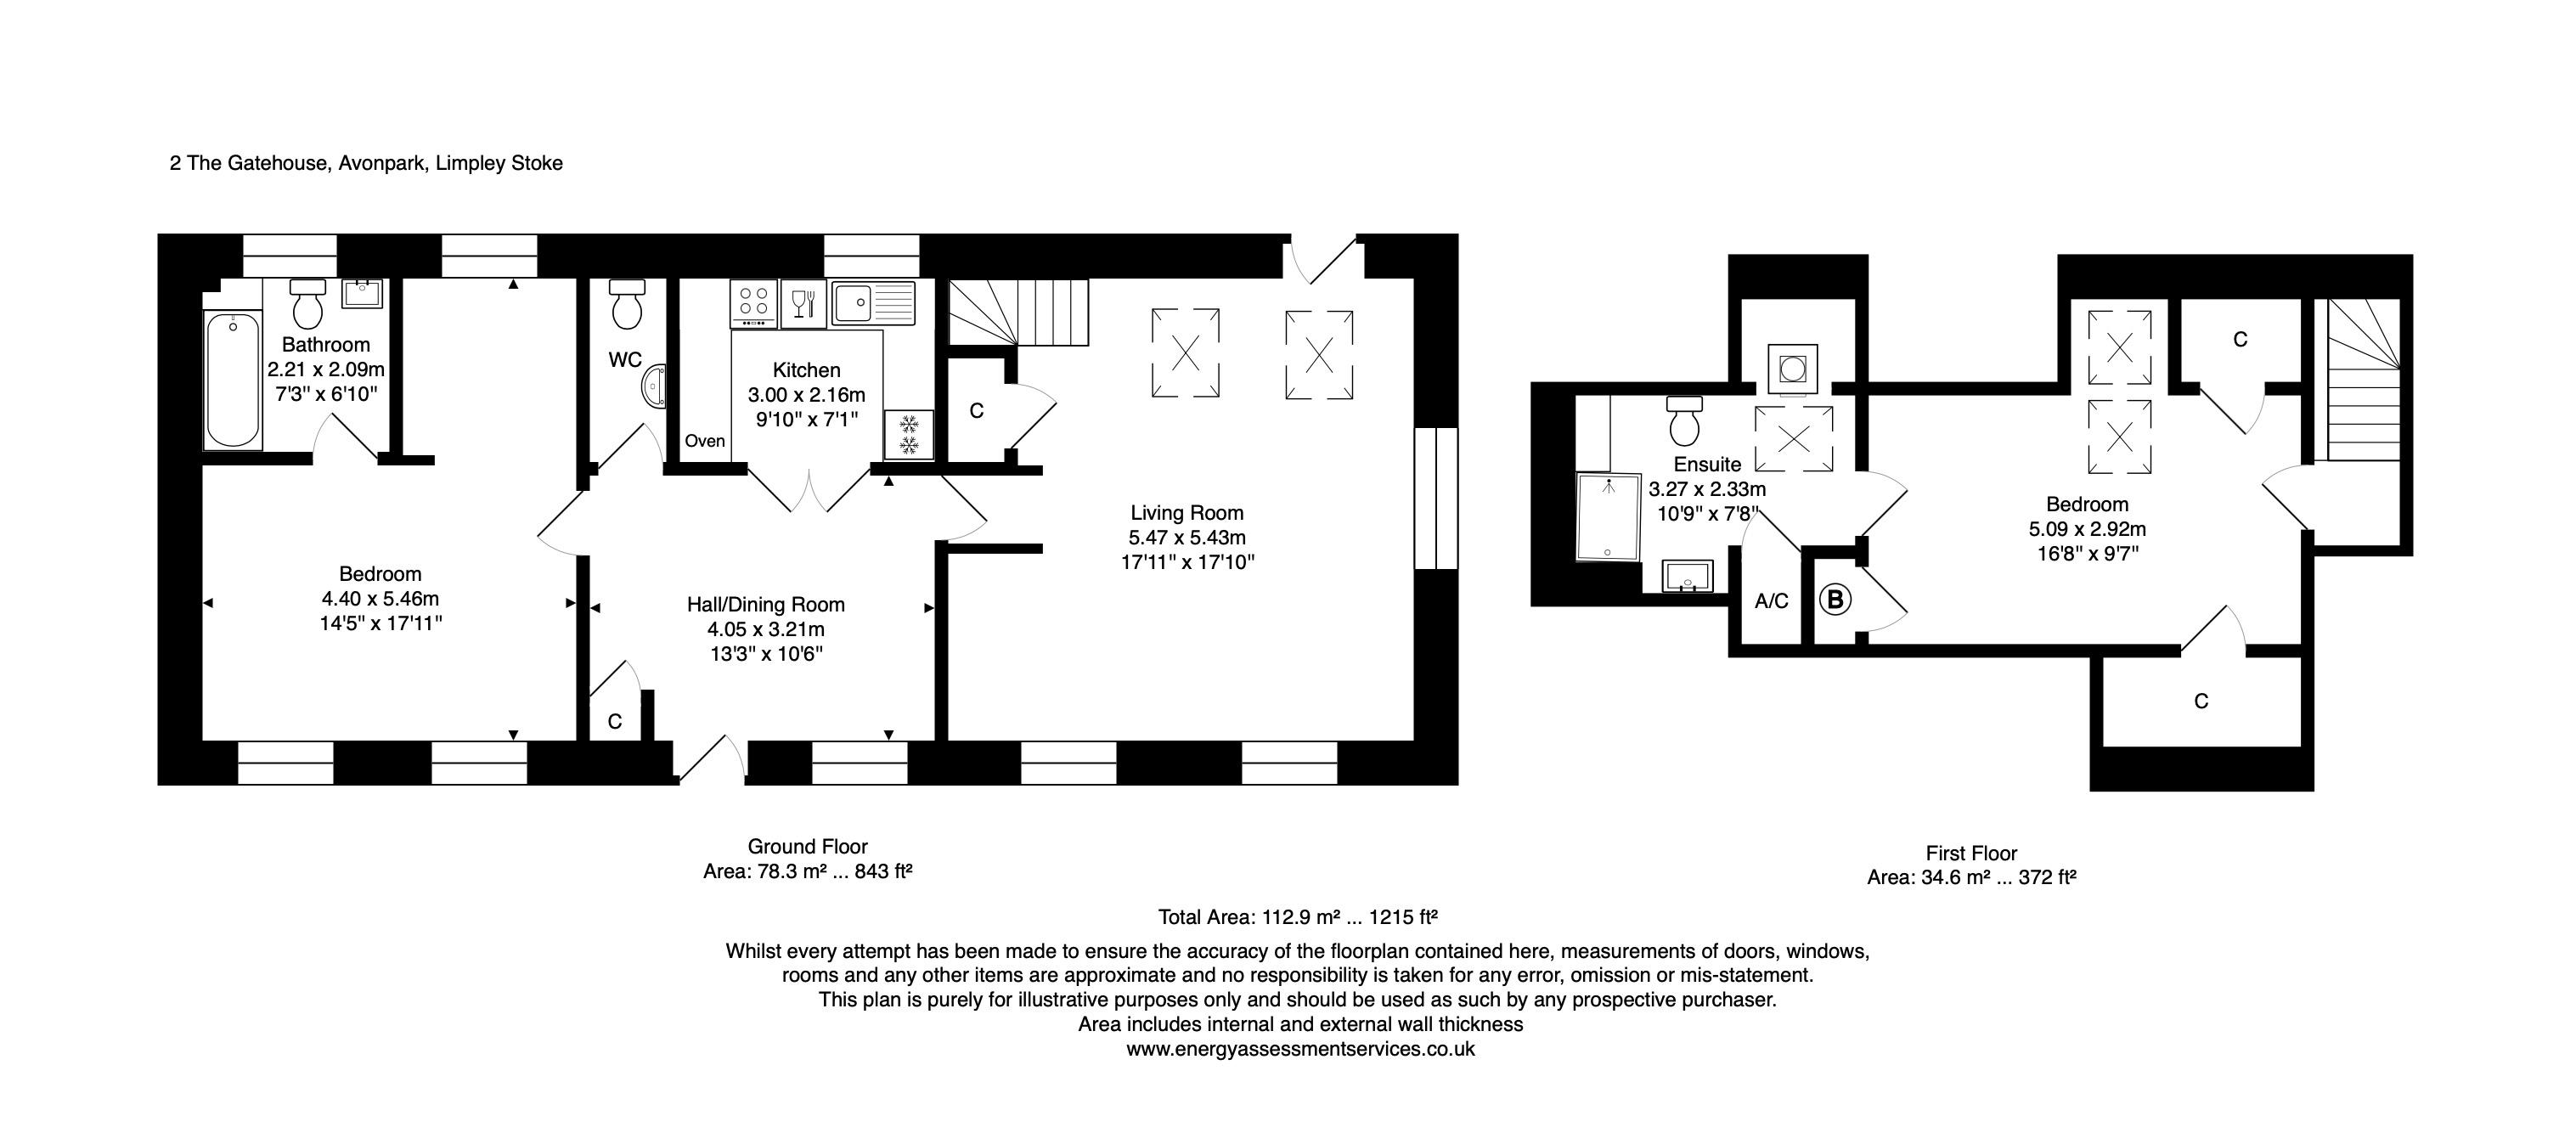 02 The Gate House Floorplan